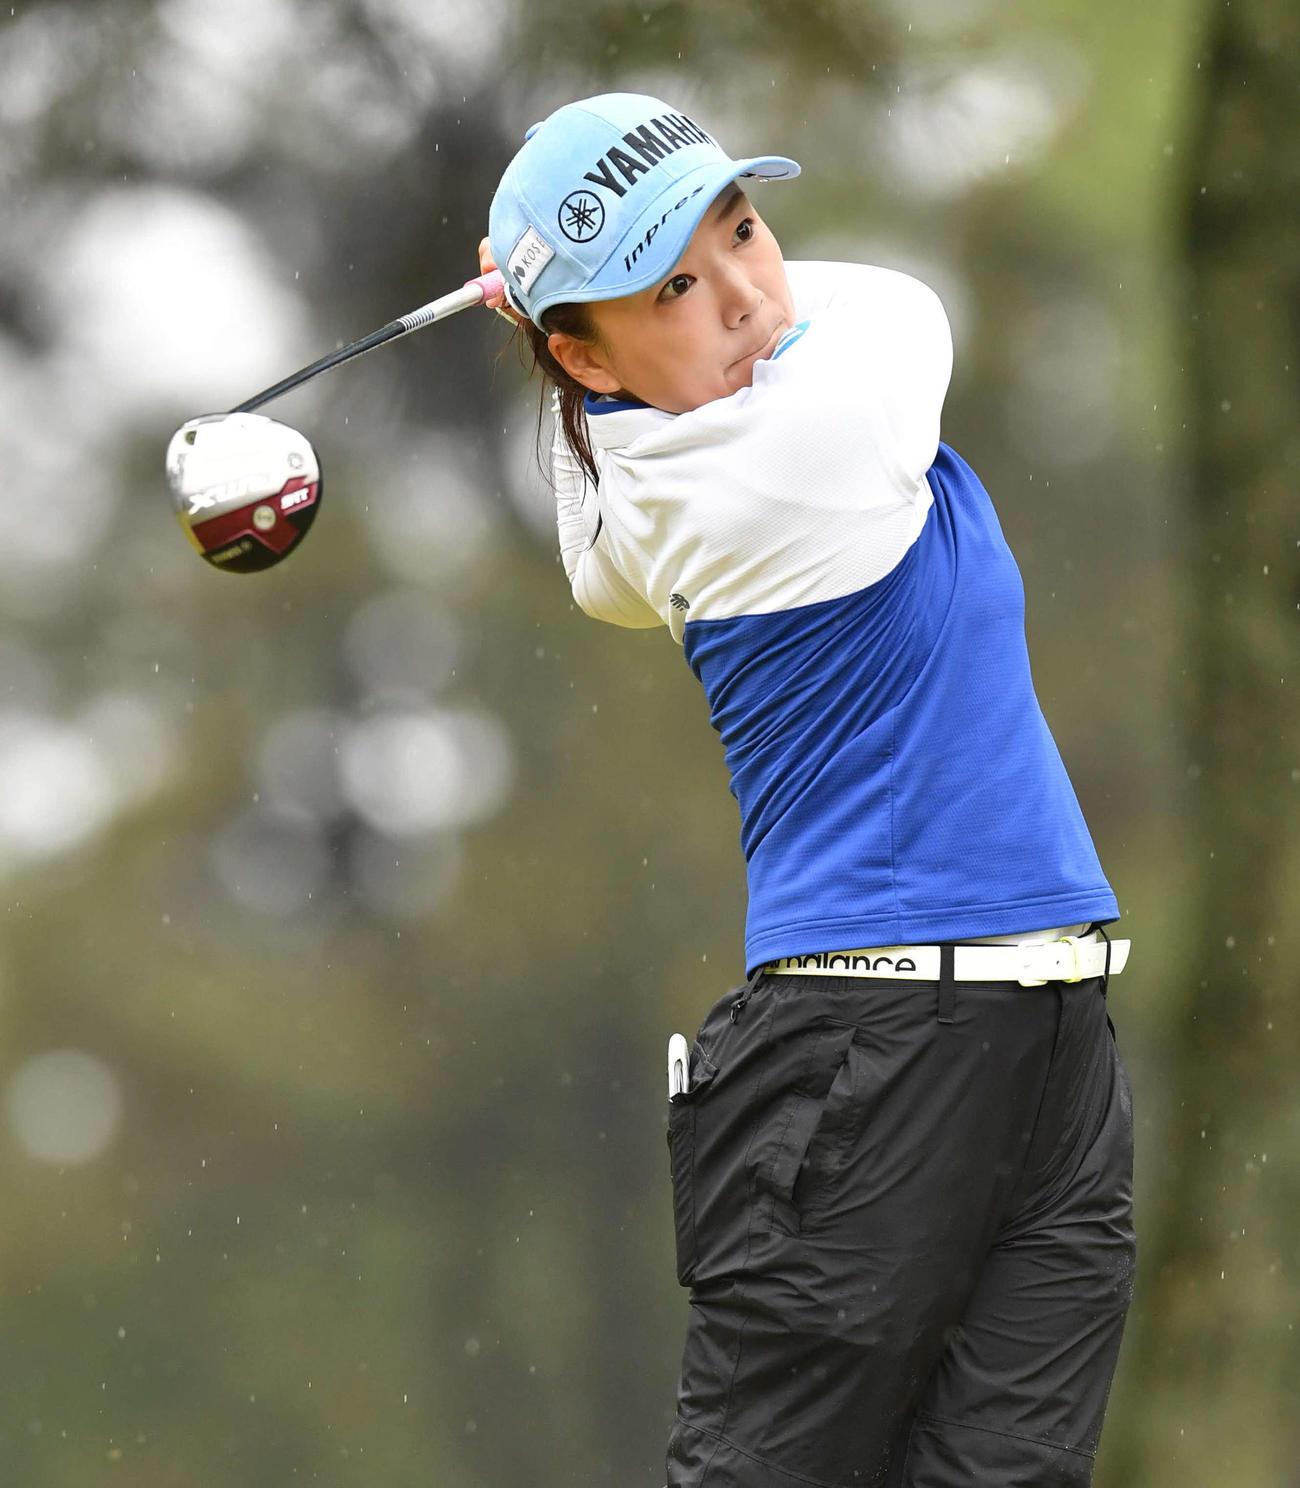 https://www.nikkansports.com/sports/golf/news/img/202104170000236-w1300_7.jpg